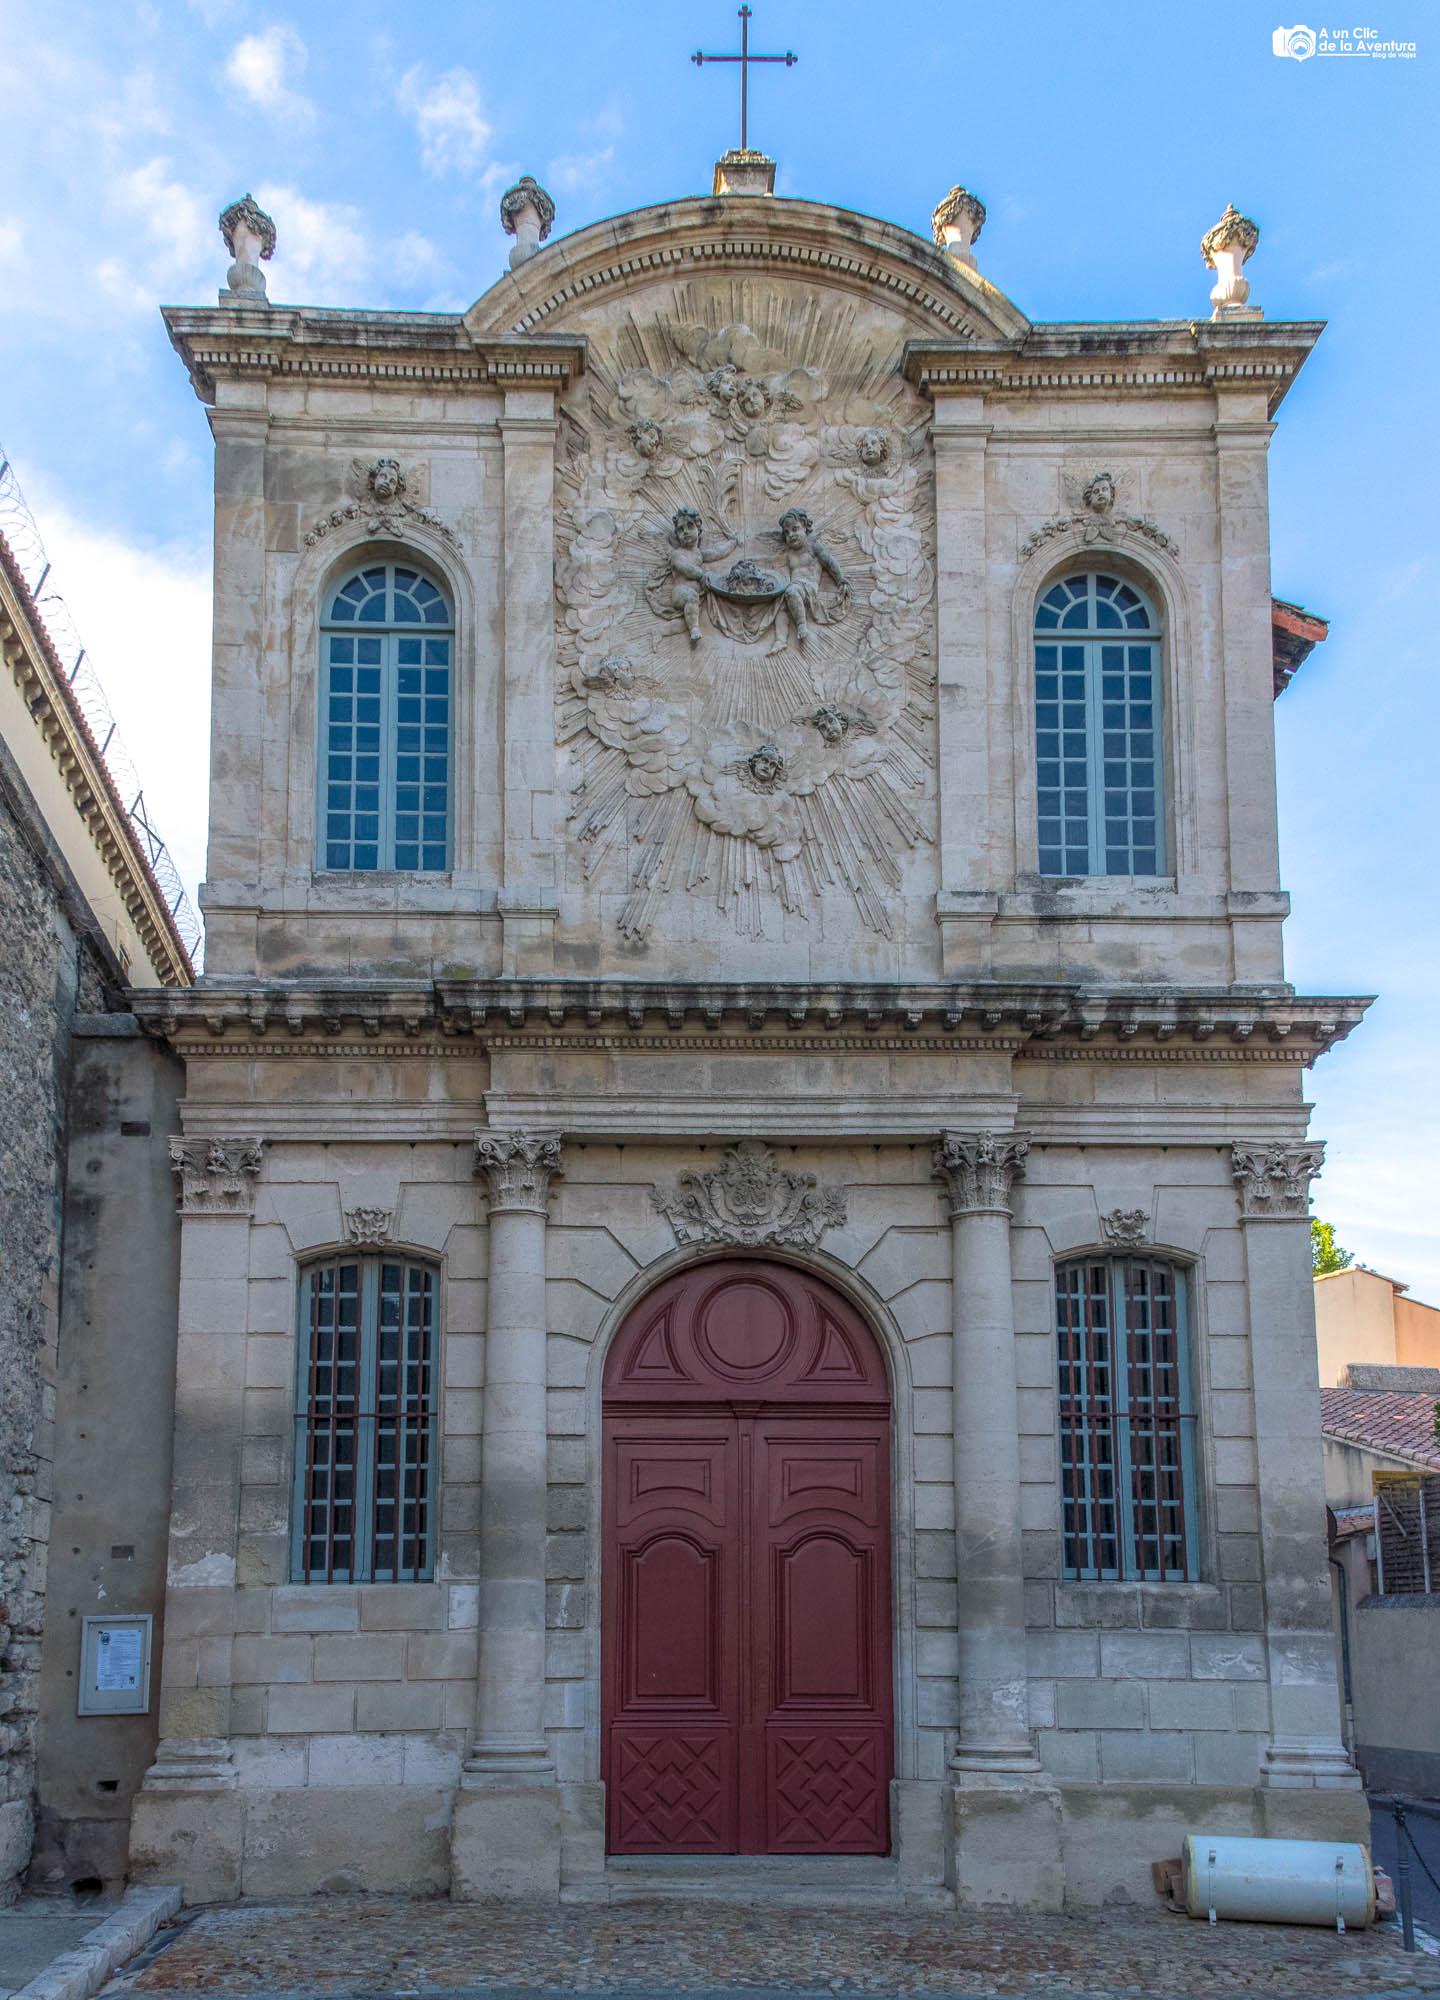 Capilla de los Penitentes Negros de Avignon